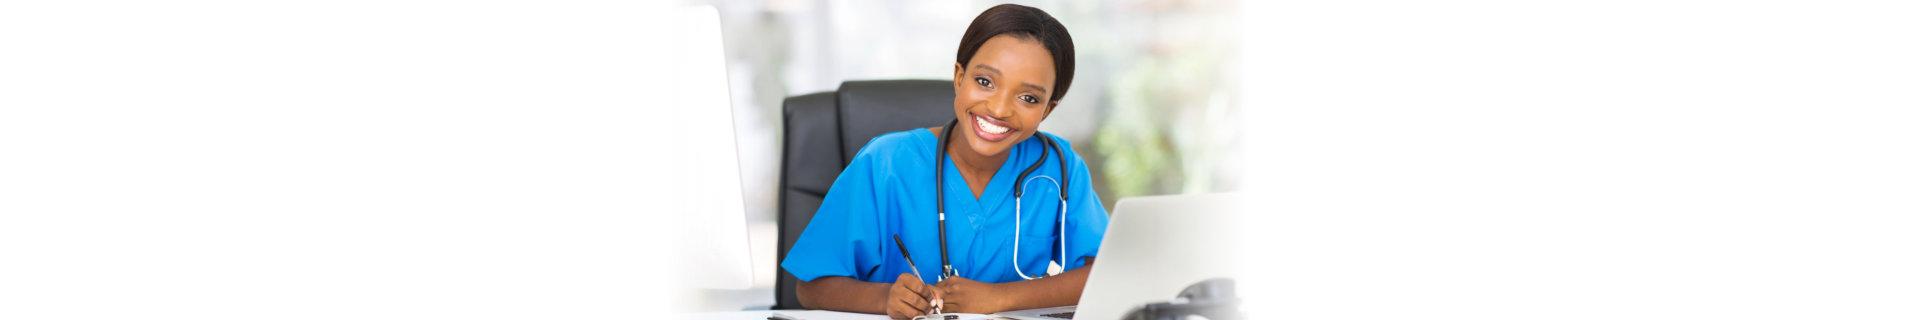 woman caregiver smiling